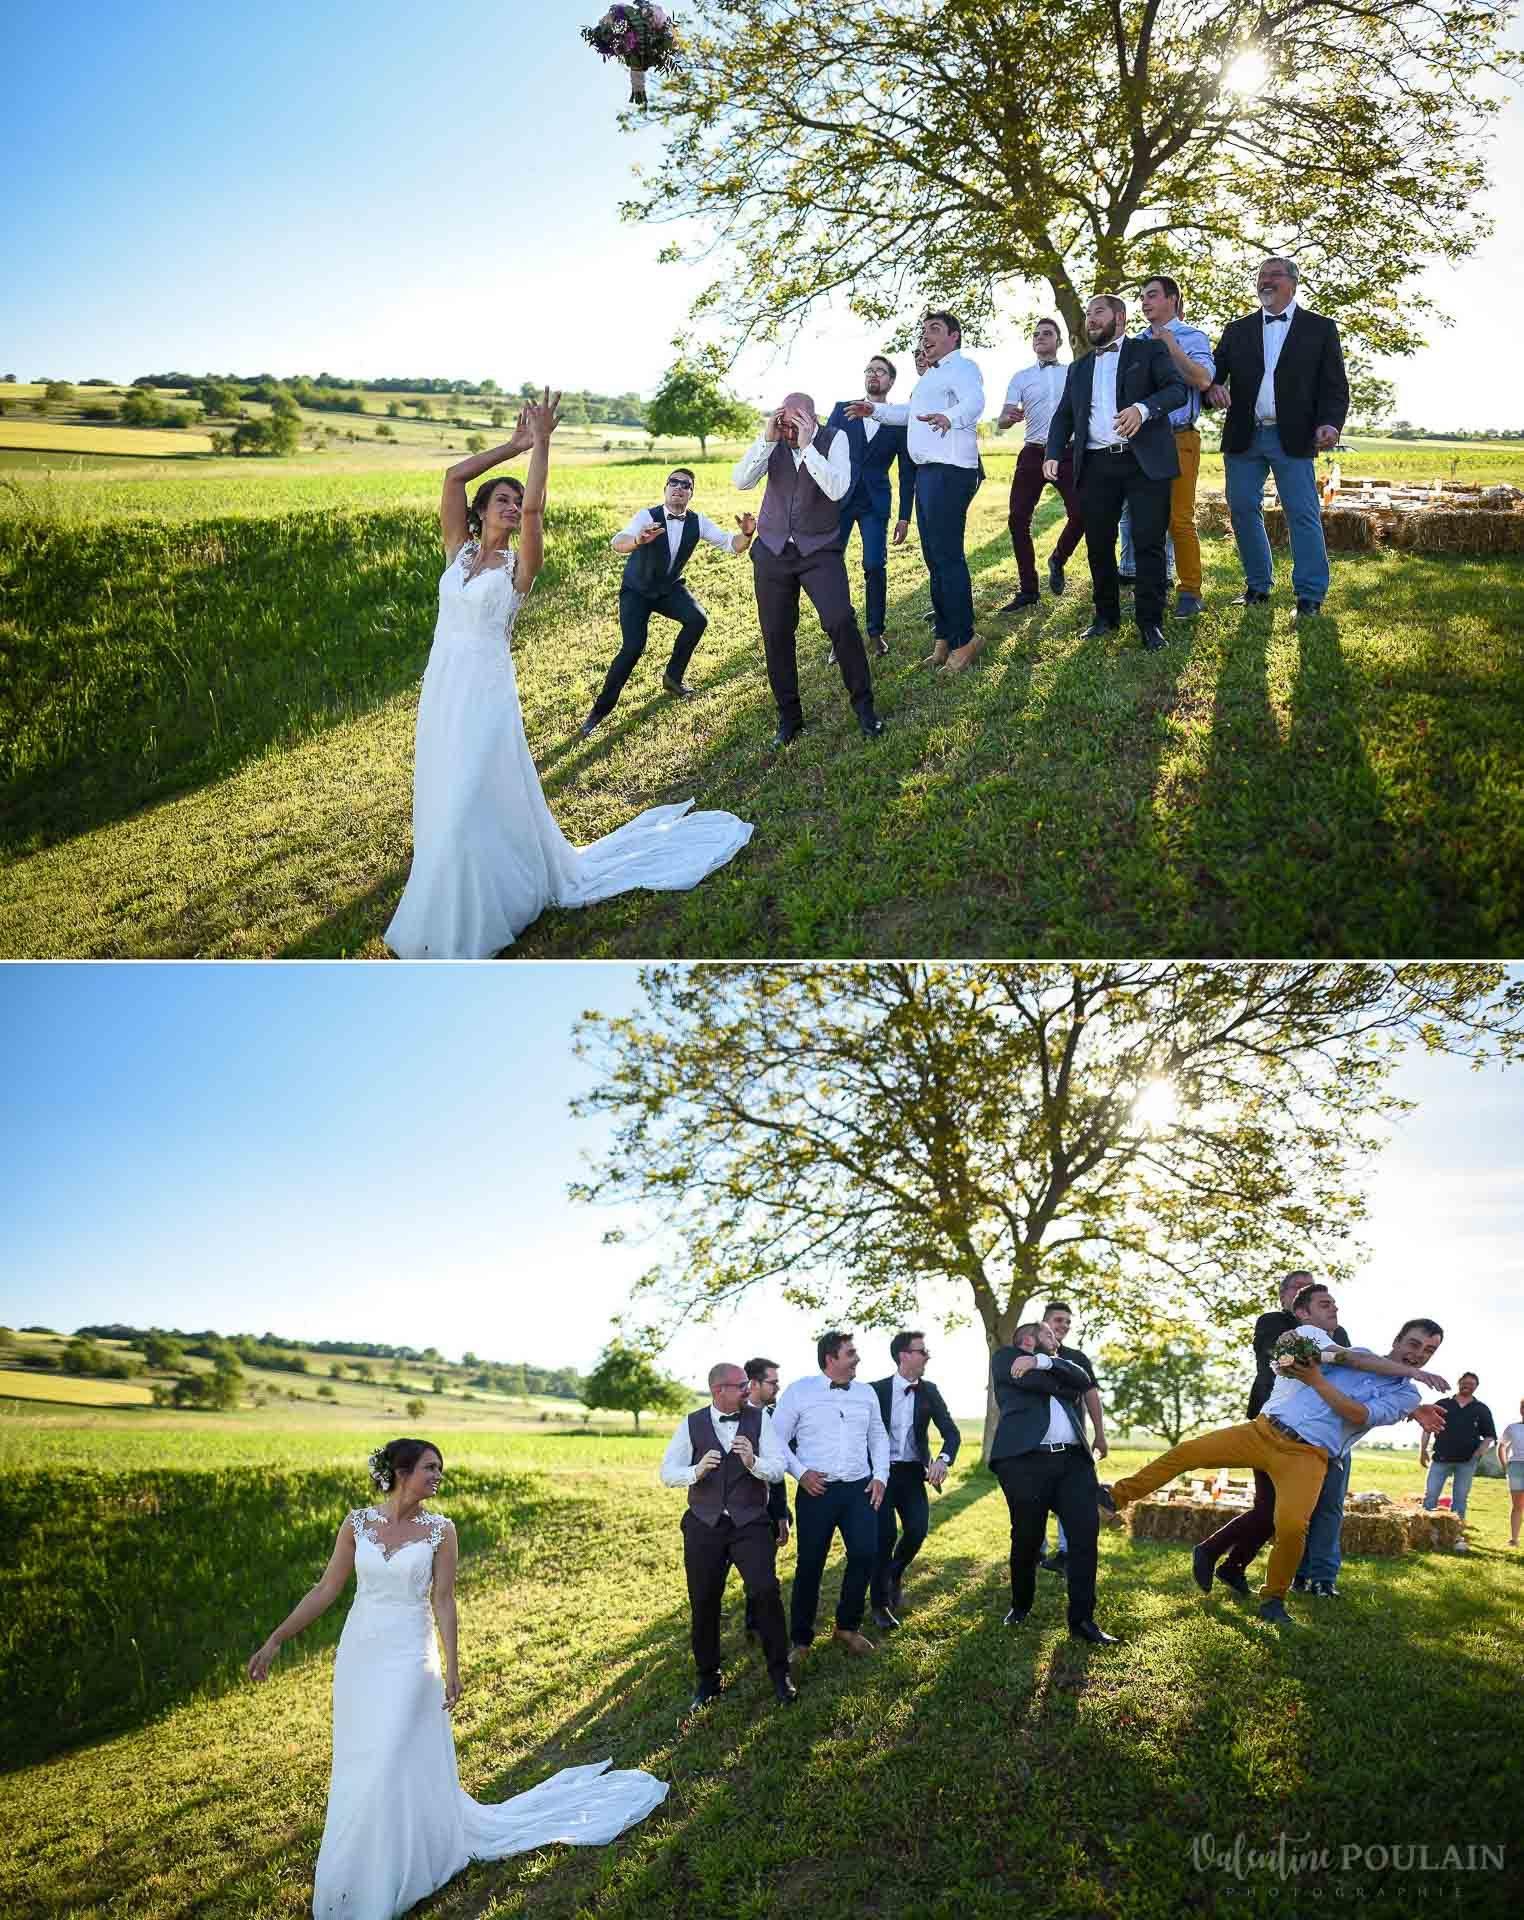 Mariage convivial Saverne - Valentine Poulain hommes